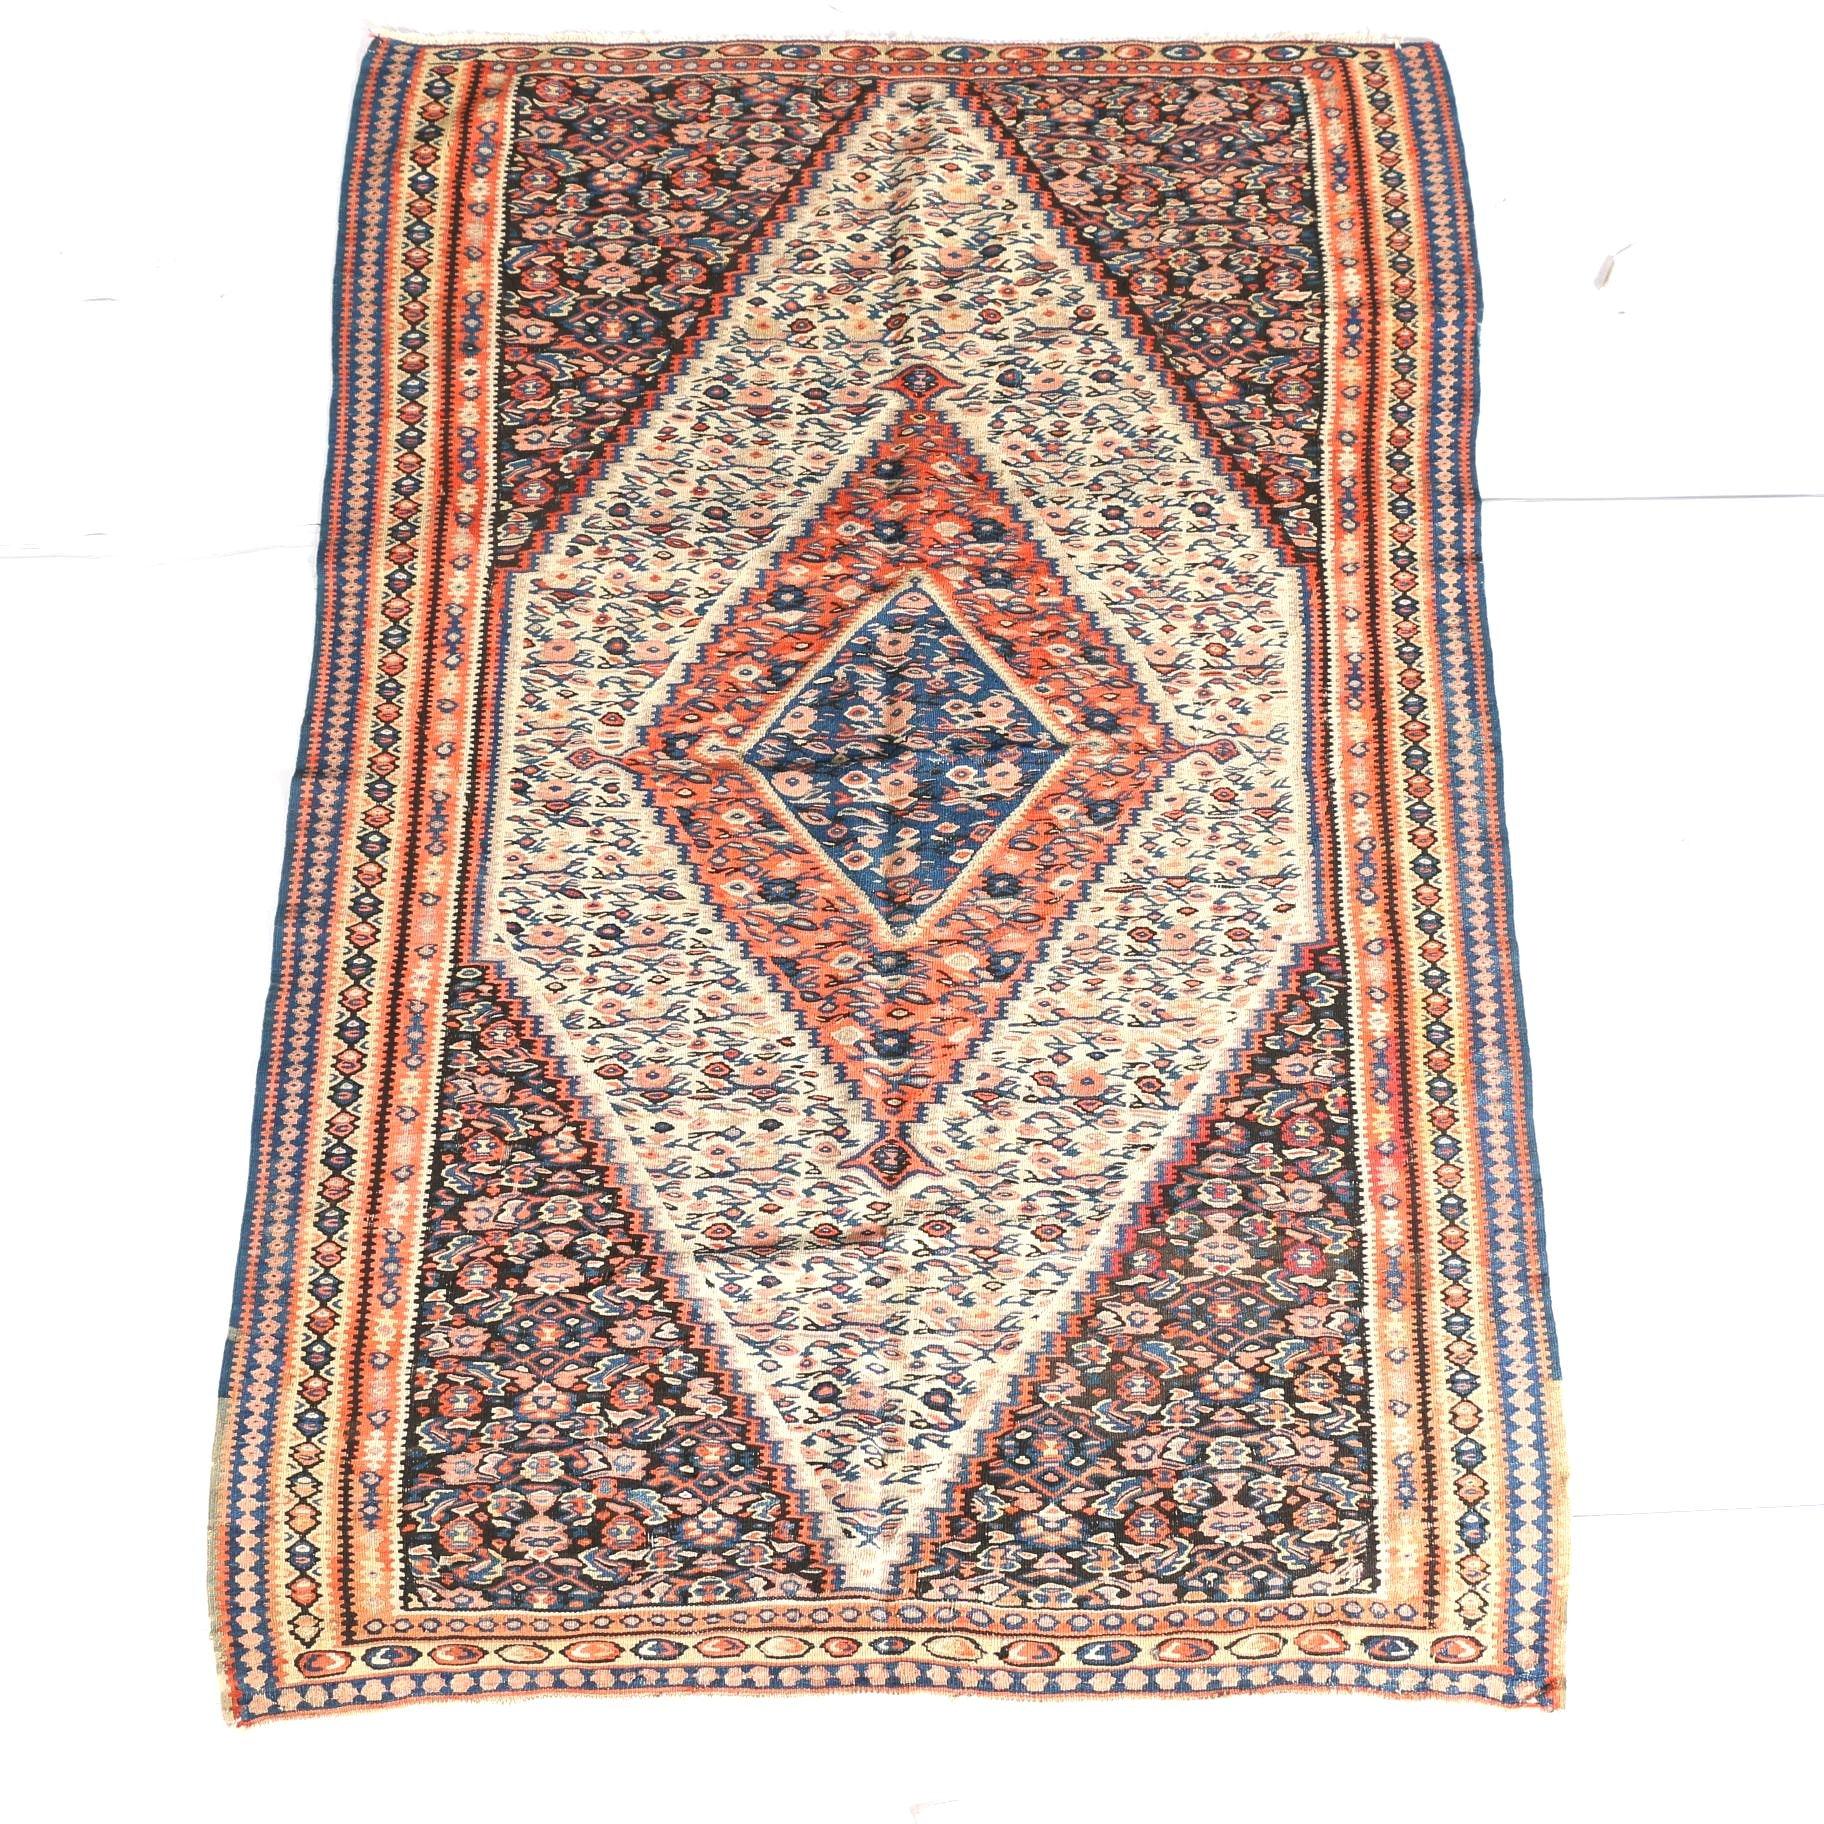 Antique Handwoven Persian Senneh Kilim, Circa 1920